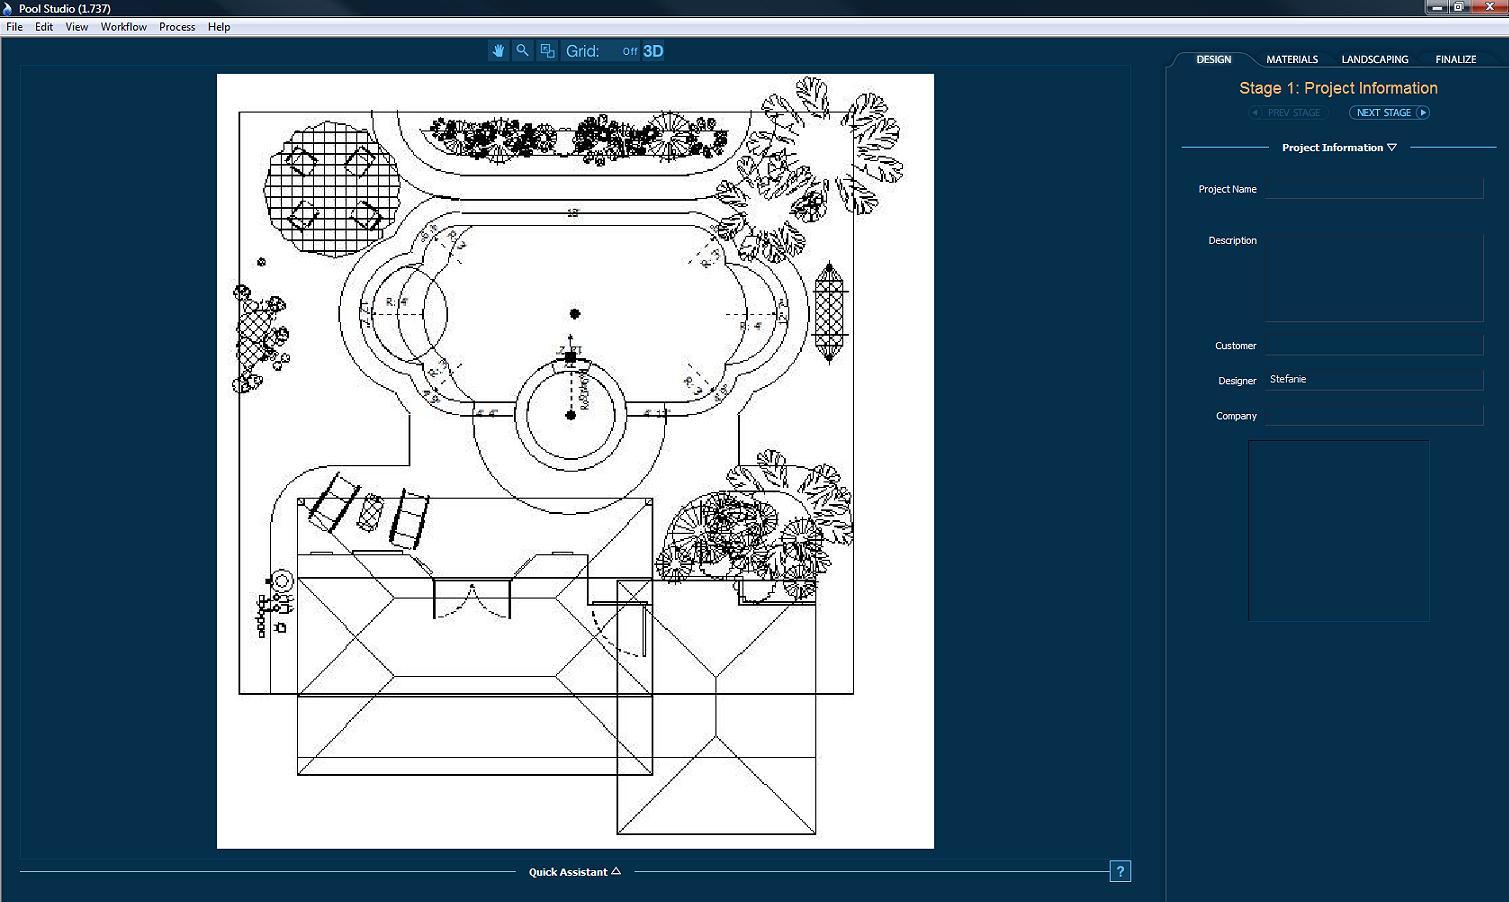 Pool Studio Background Image in 2D Viewport